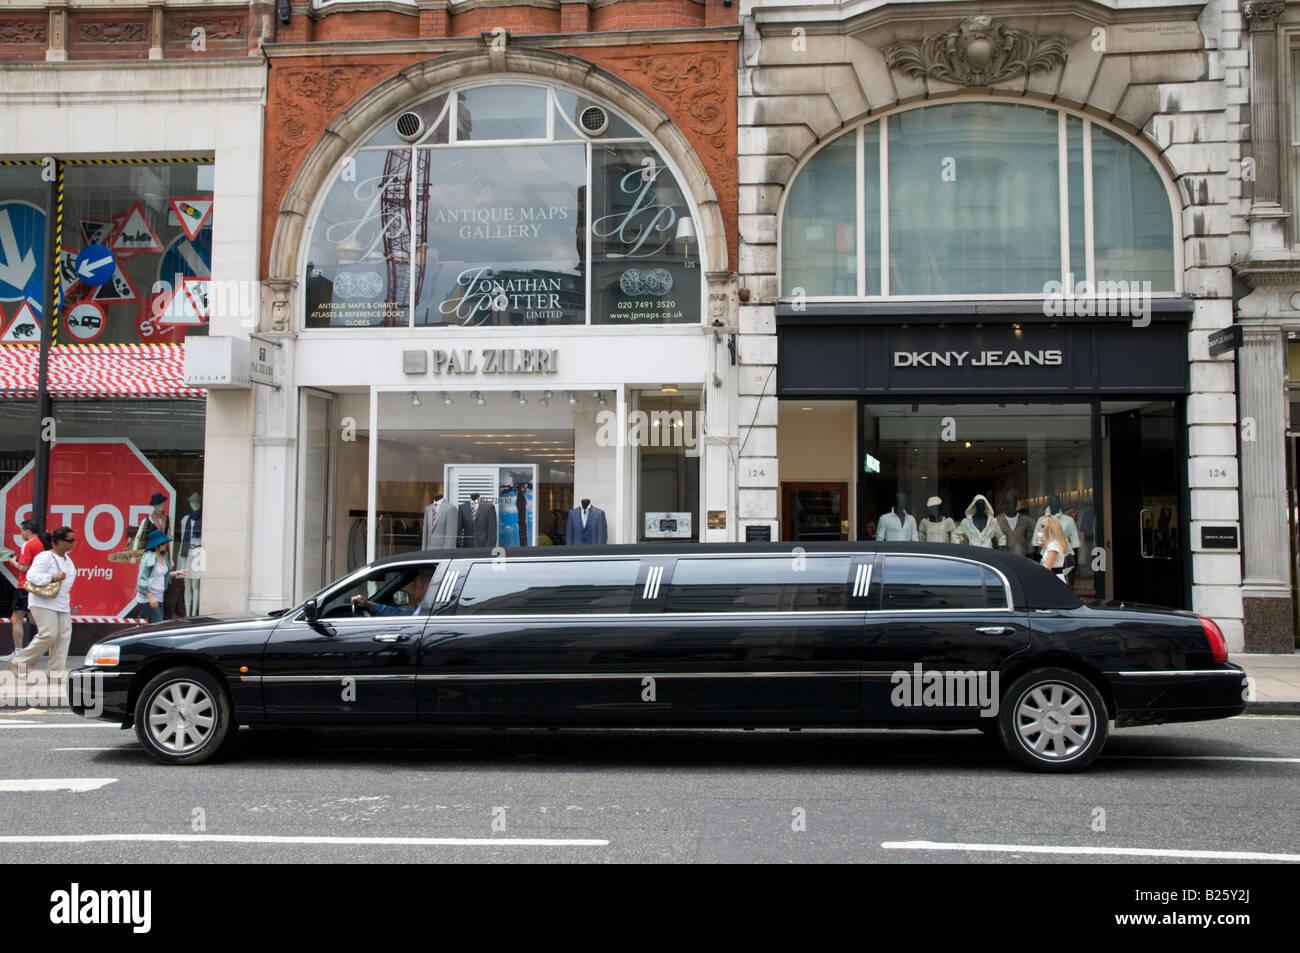 Stretch limousine in New Bond Street London England UK - Stock Image